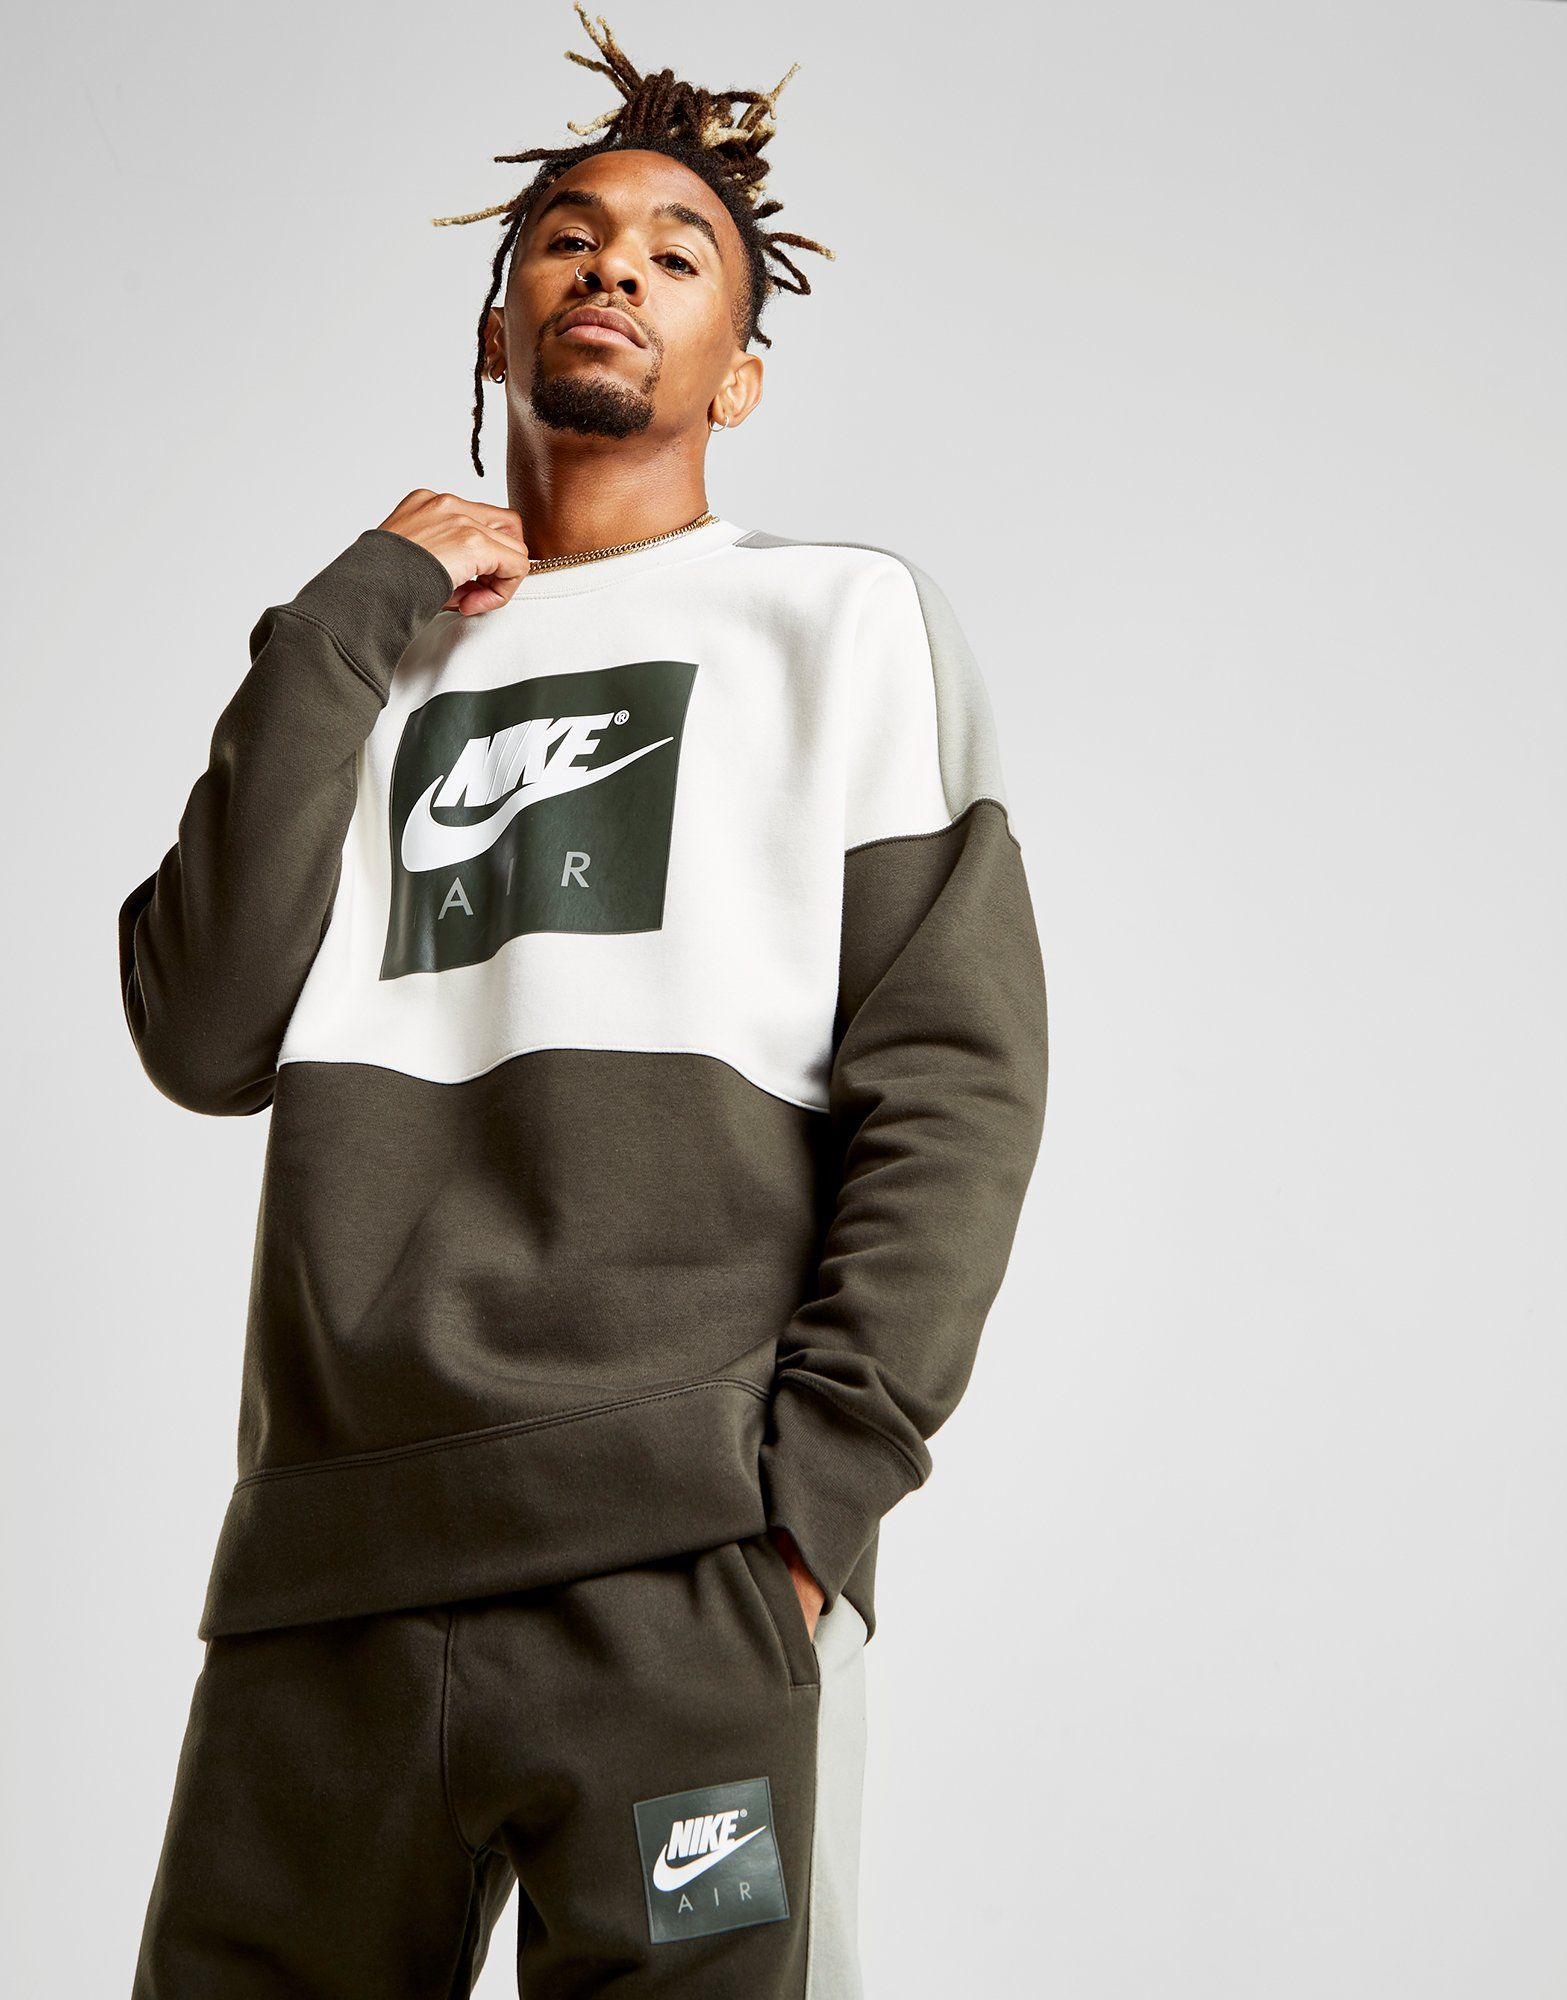 Nike Air Colourblock Sweatshirt - Only at JD -